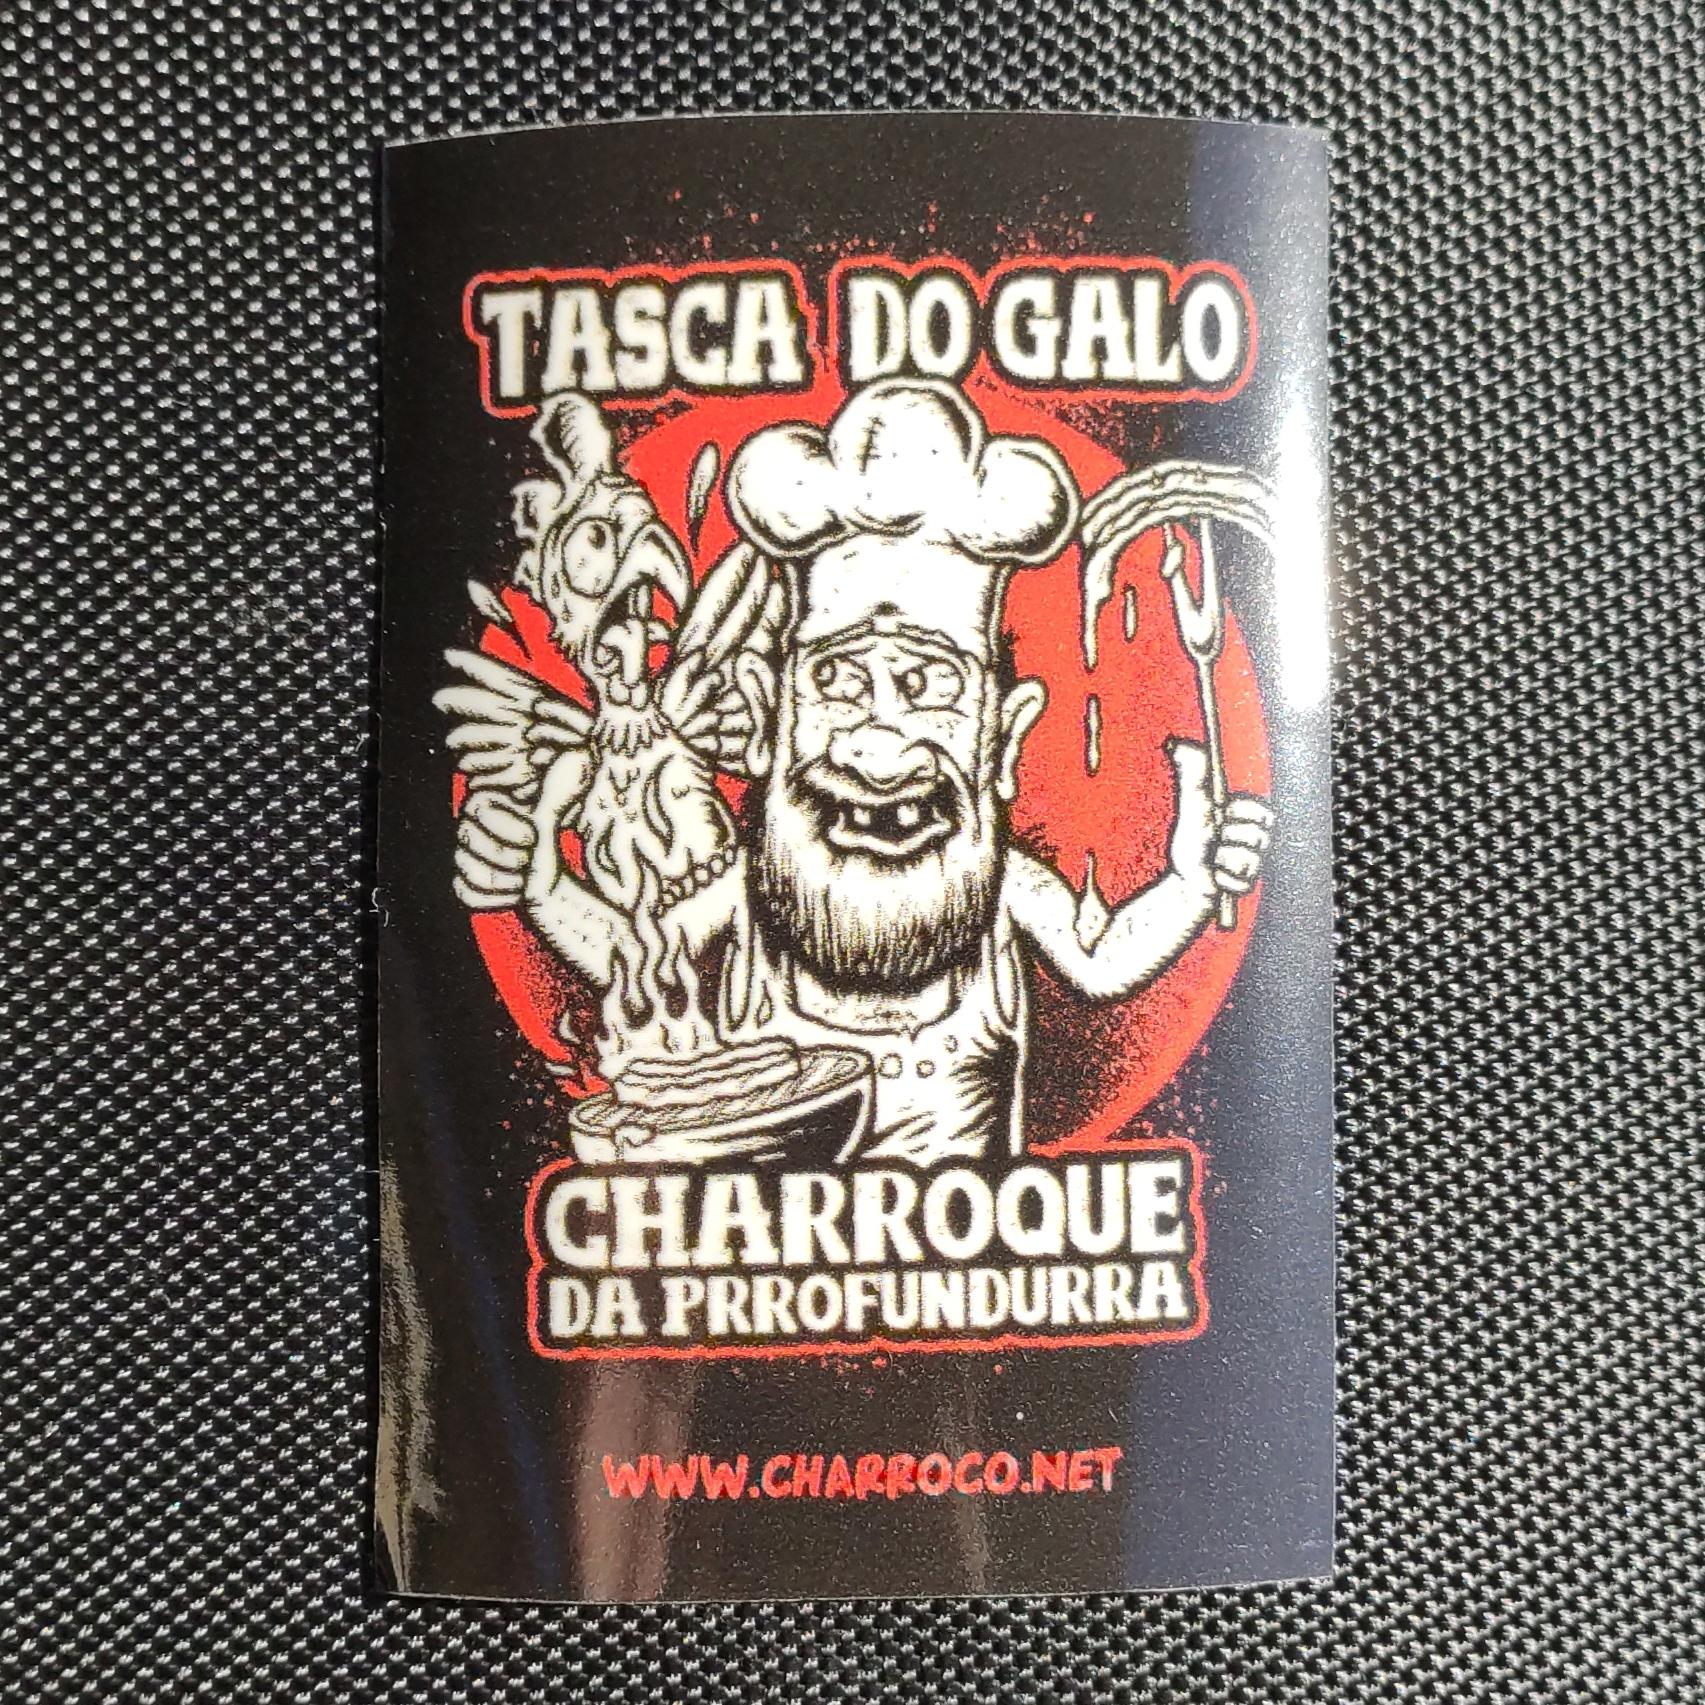 Tasca do Galo